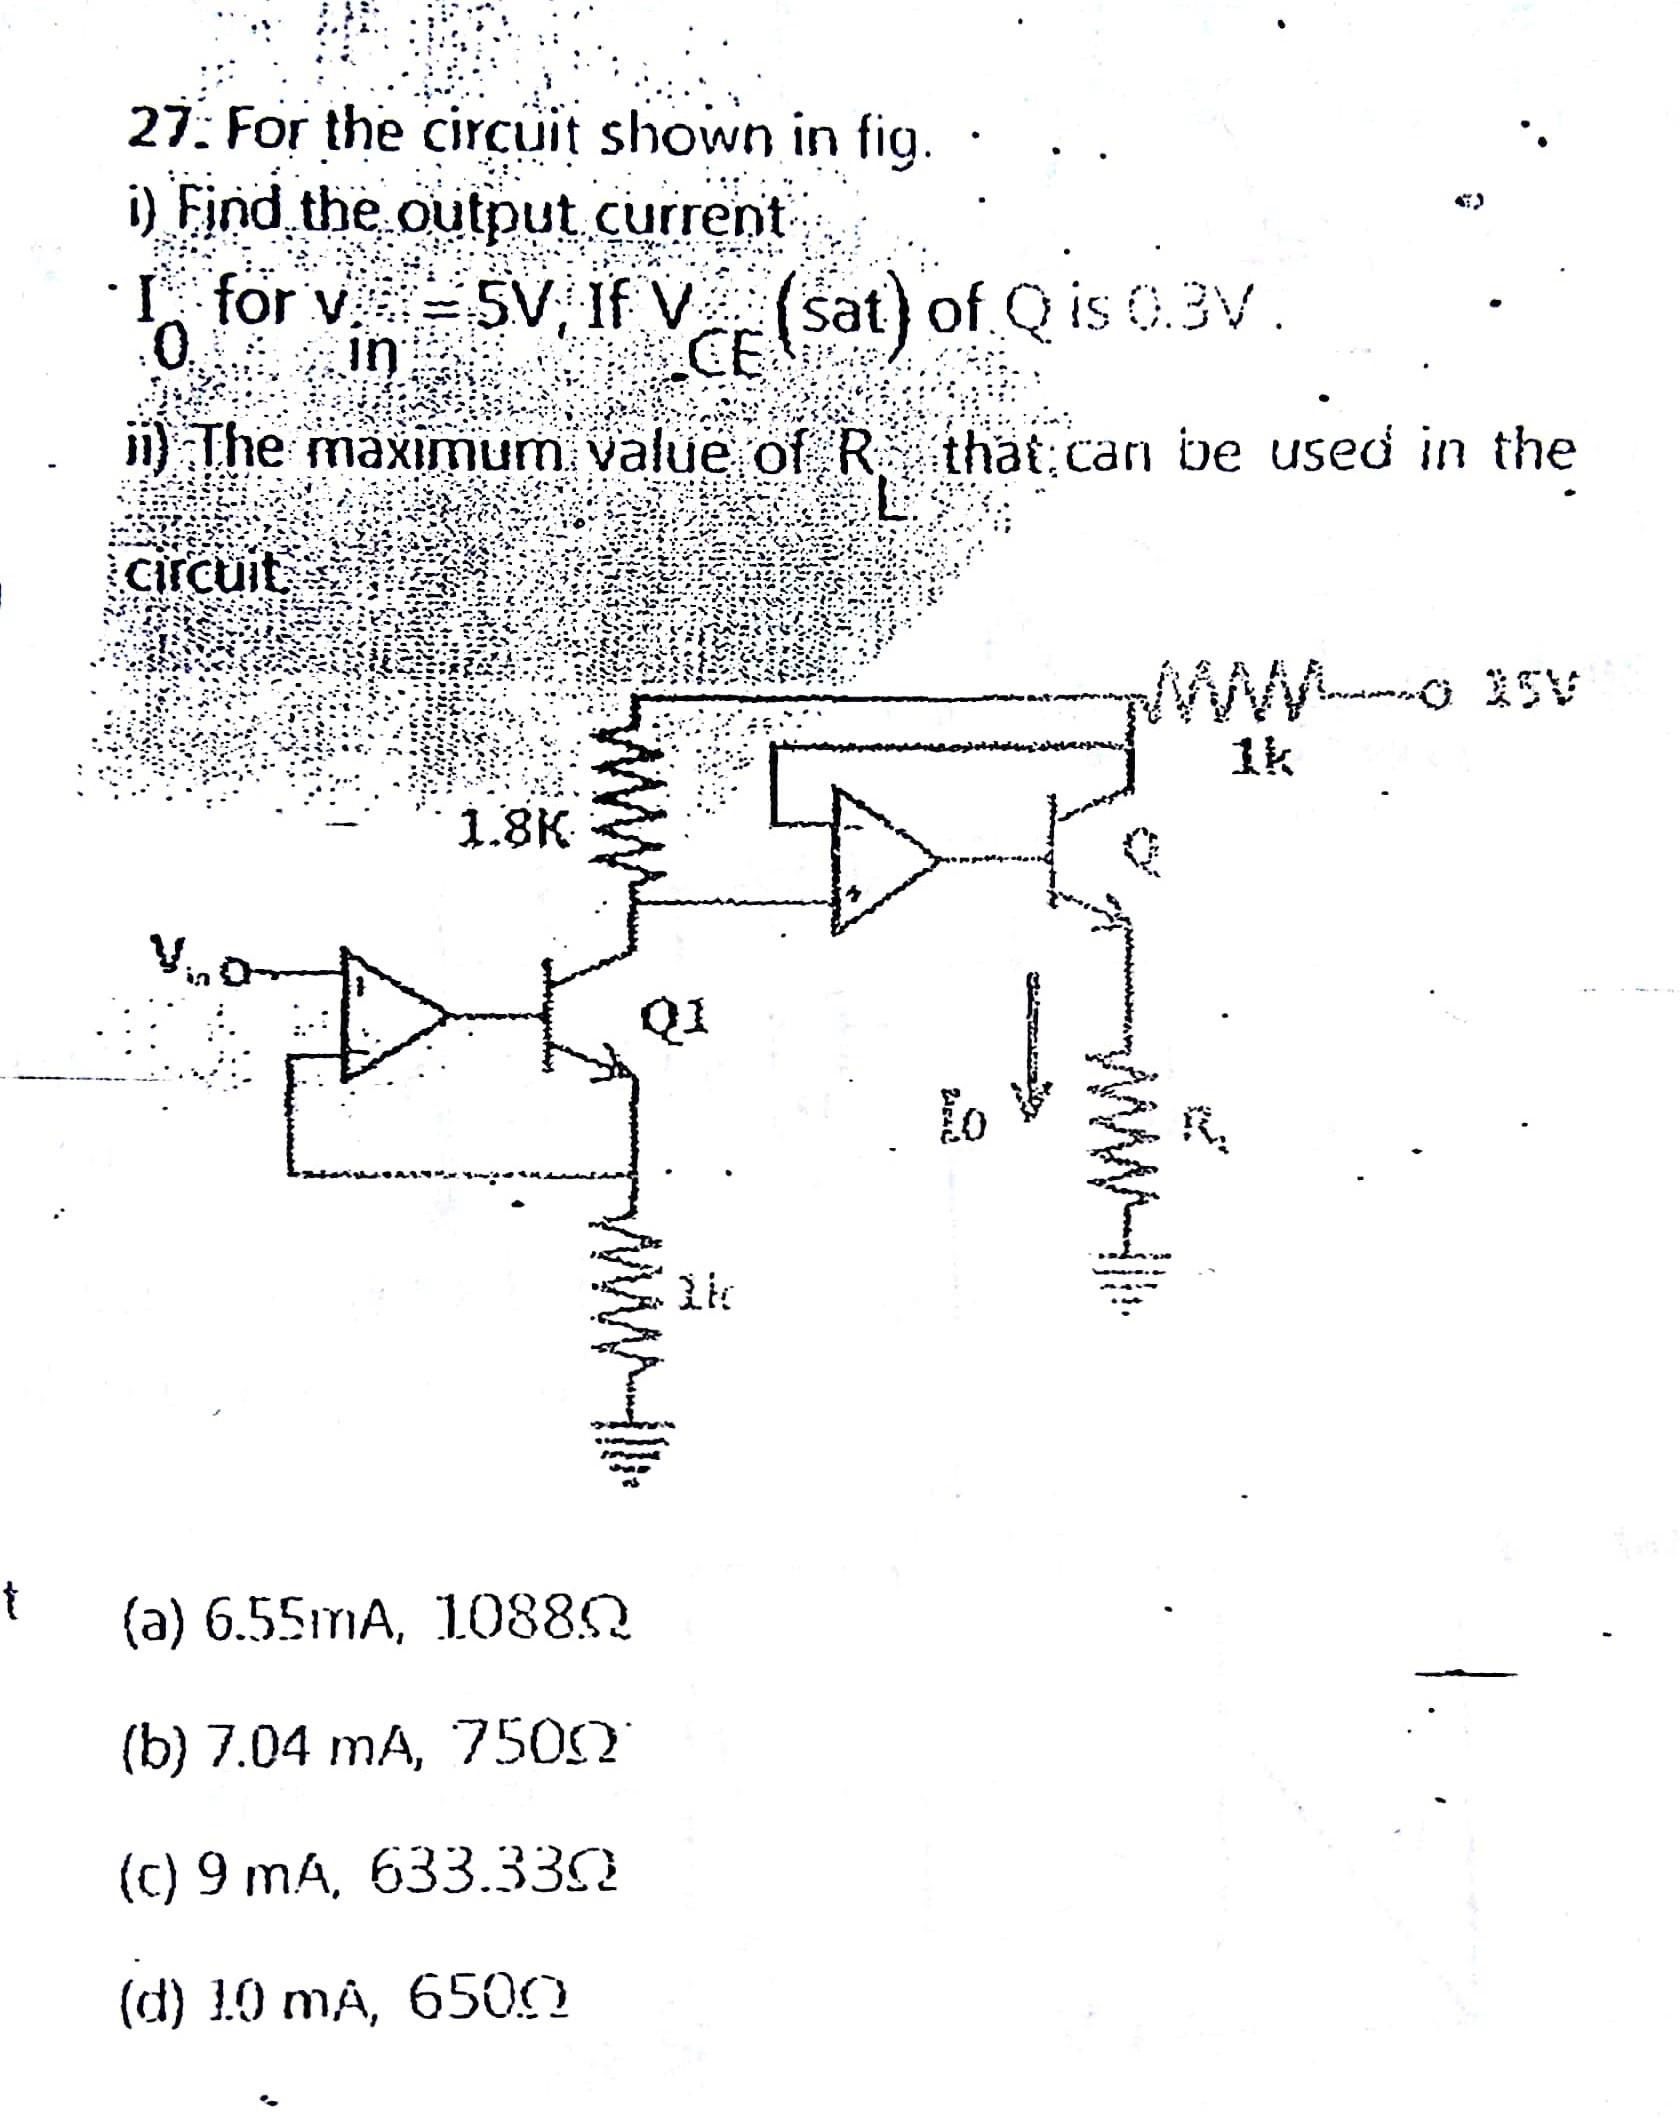 operational amplifier circuit analysis